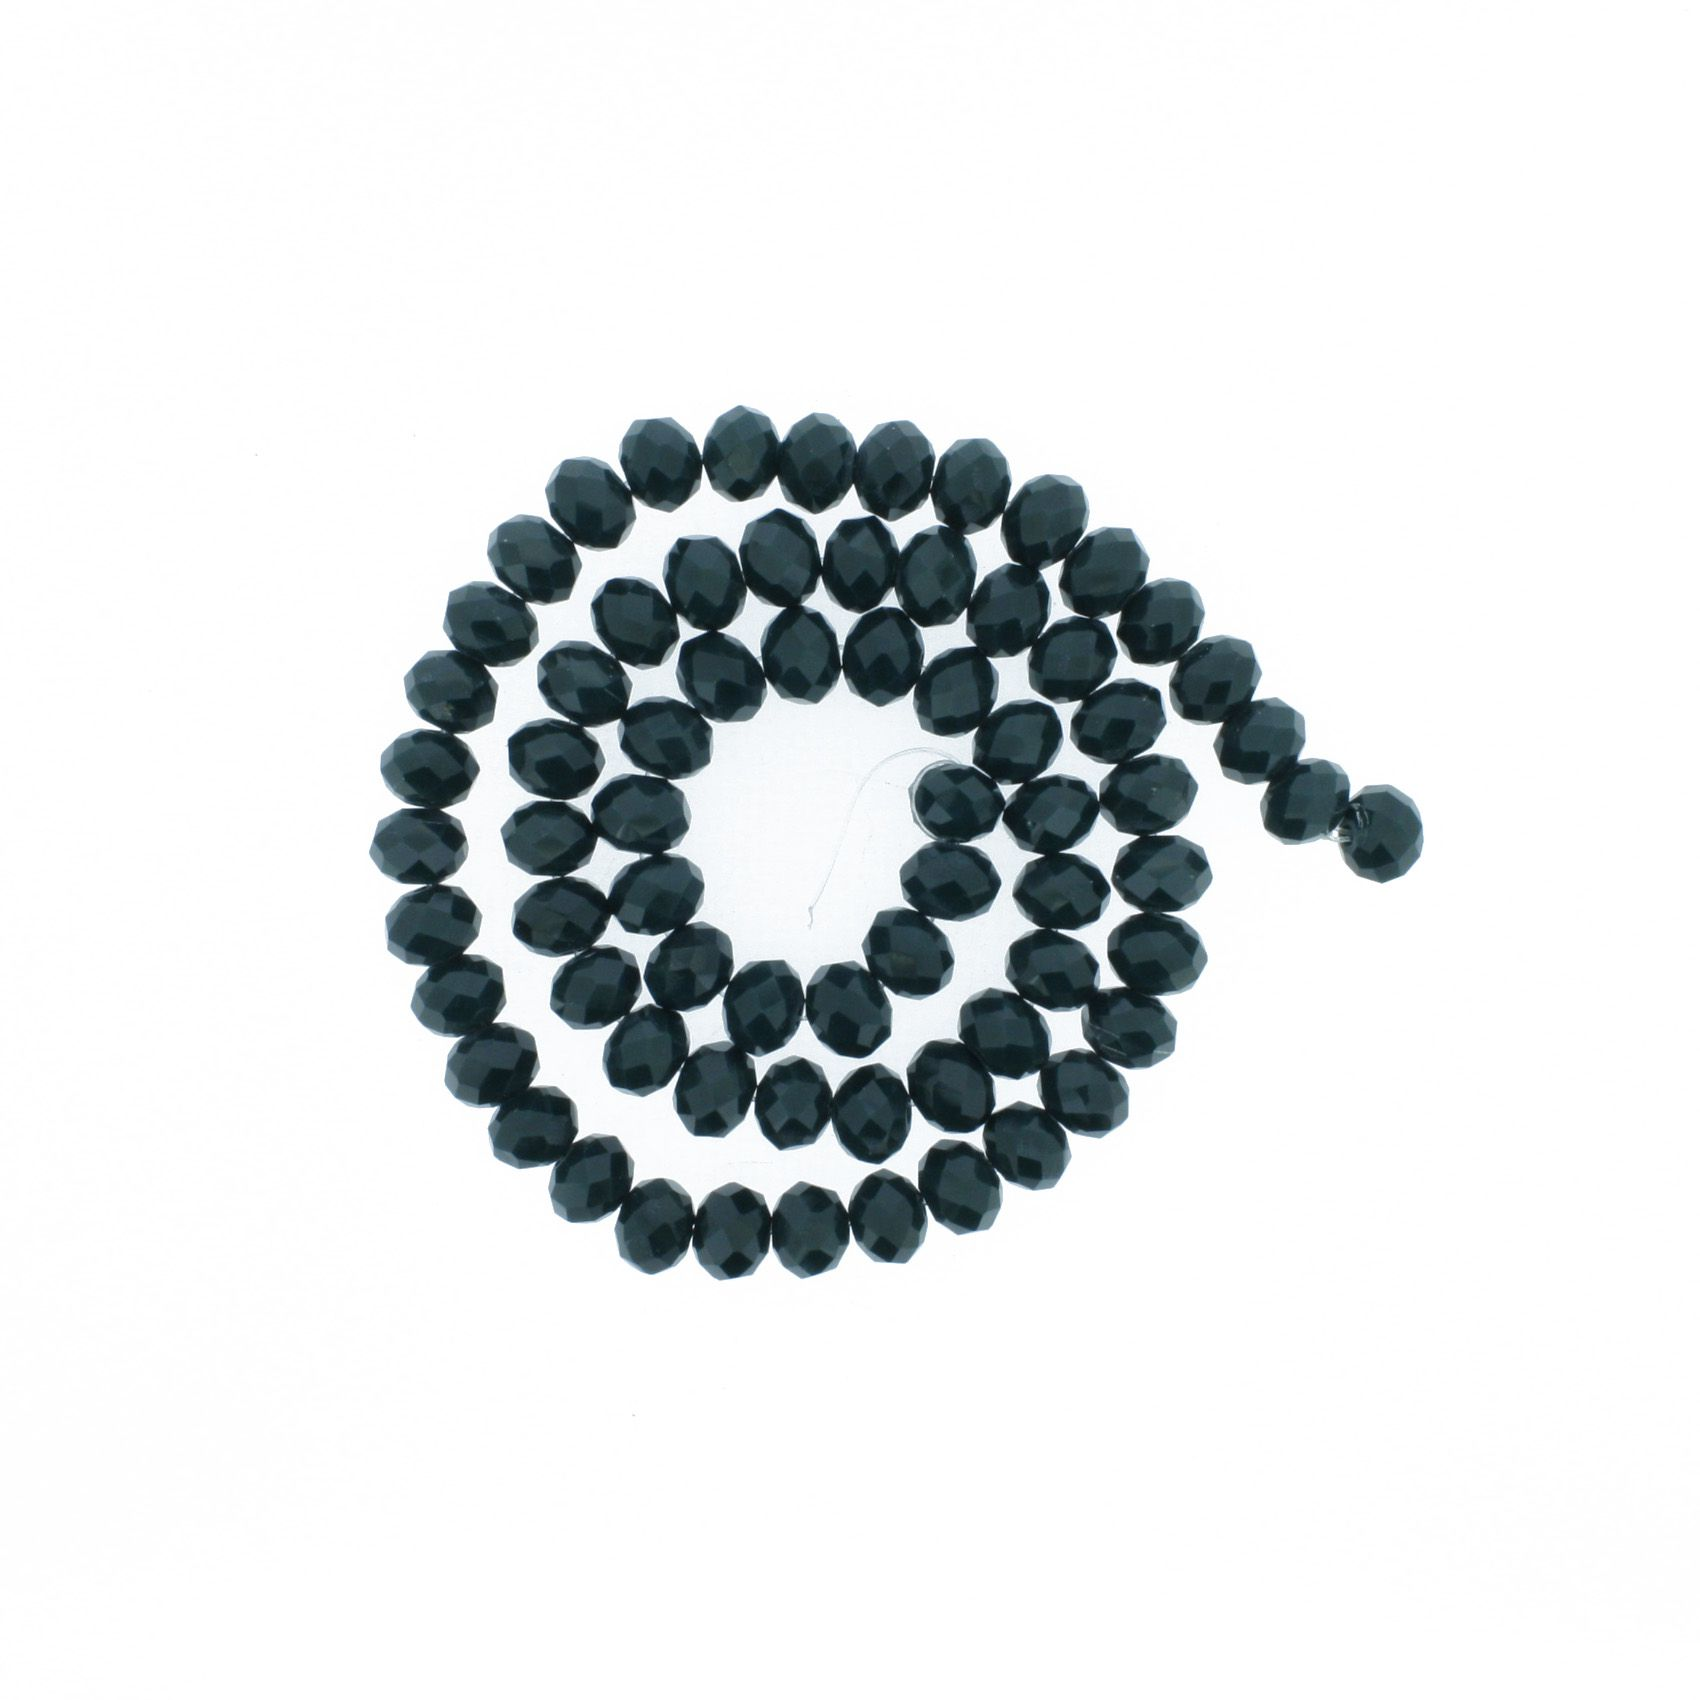 Fio de Cristal - Piatto® - Verde Escuro - 8mm  - Universo Religioso® - Artigos de Umbanda e Candomblé